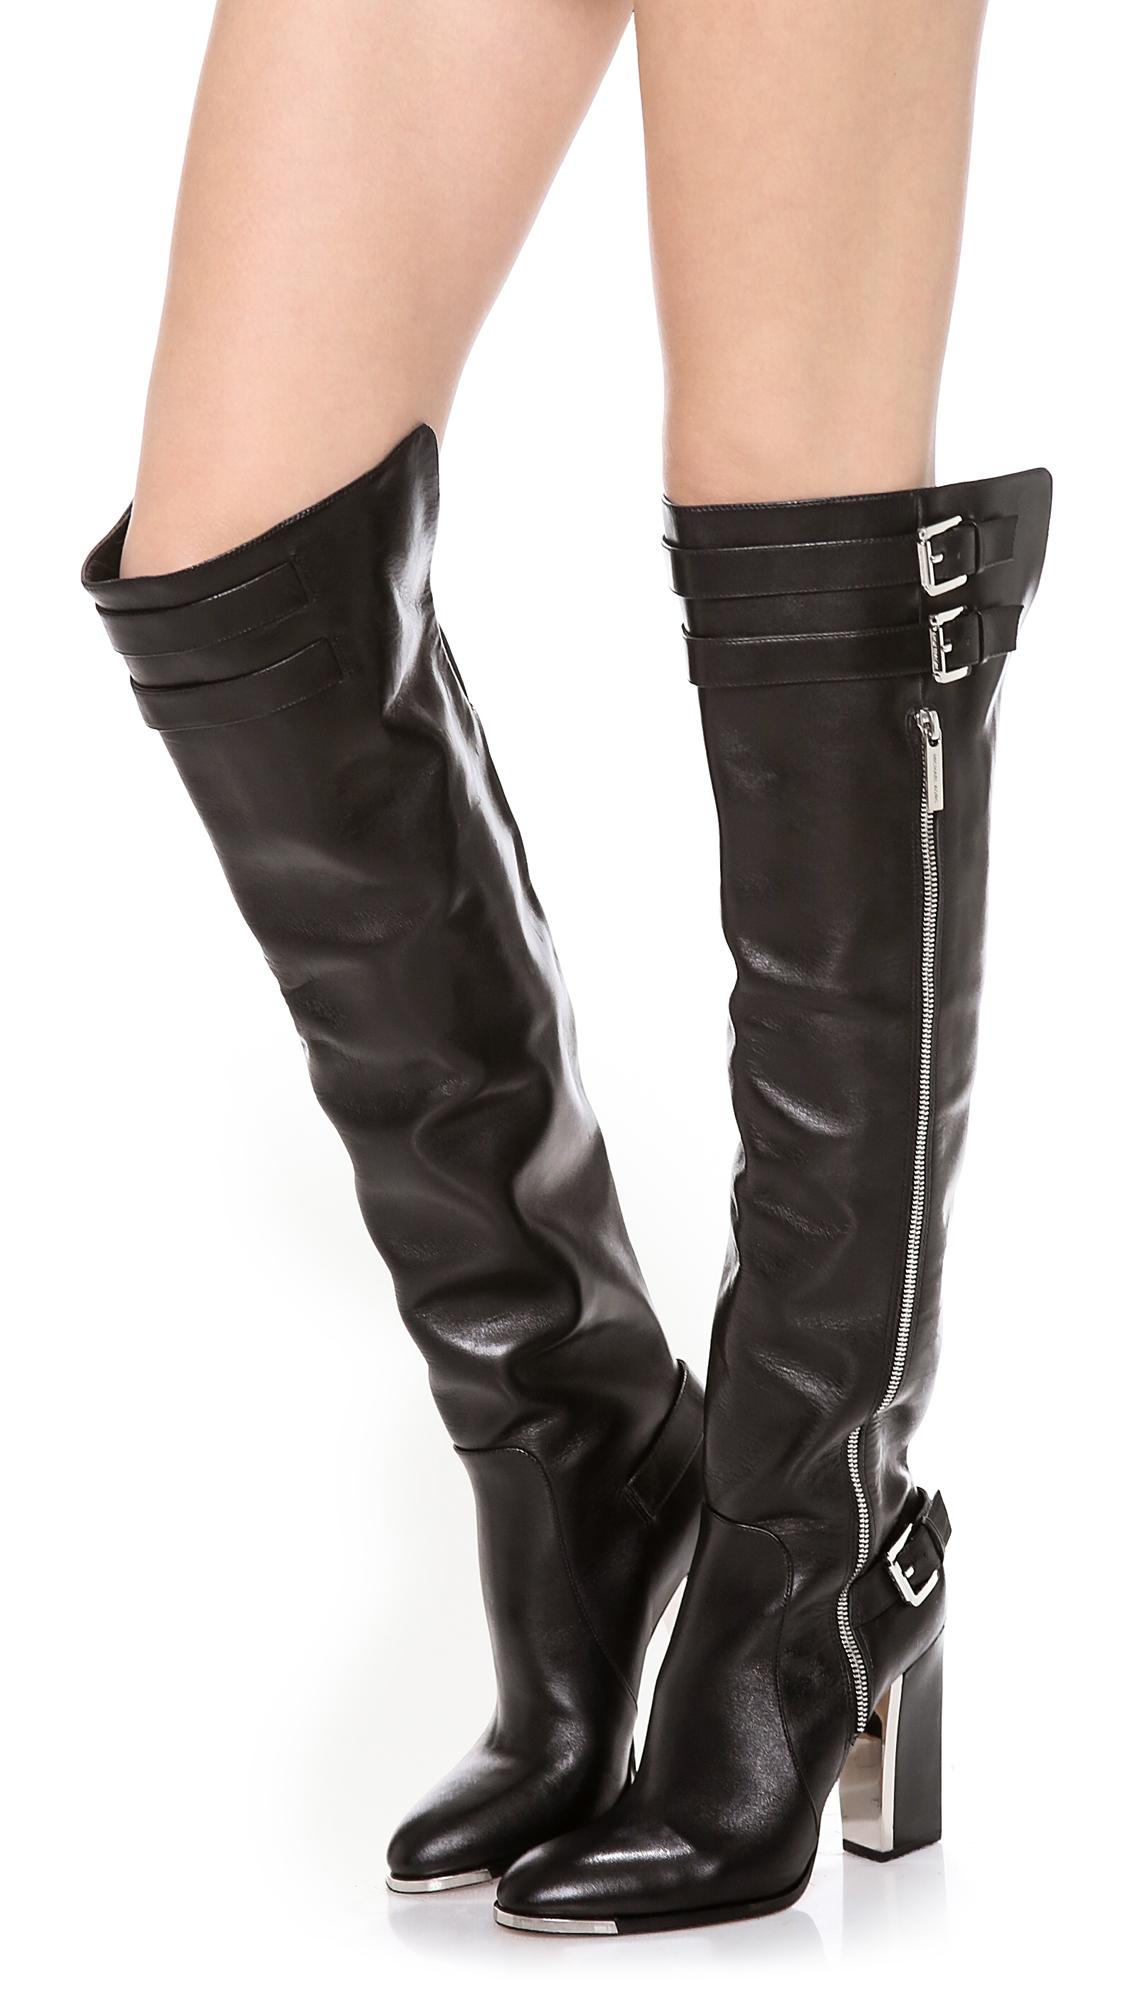 Michael Kors Jayla Tall Boots in Black